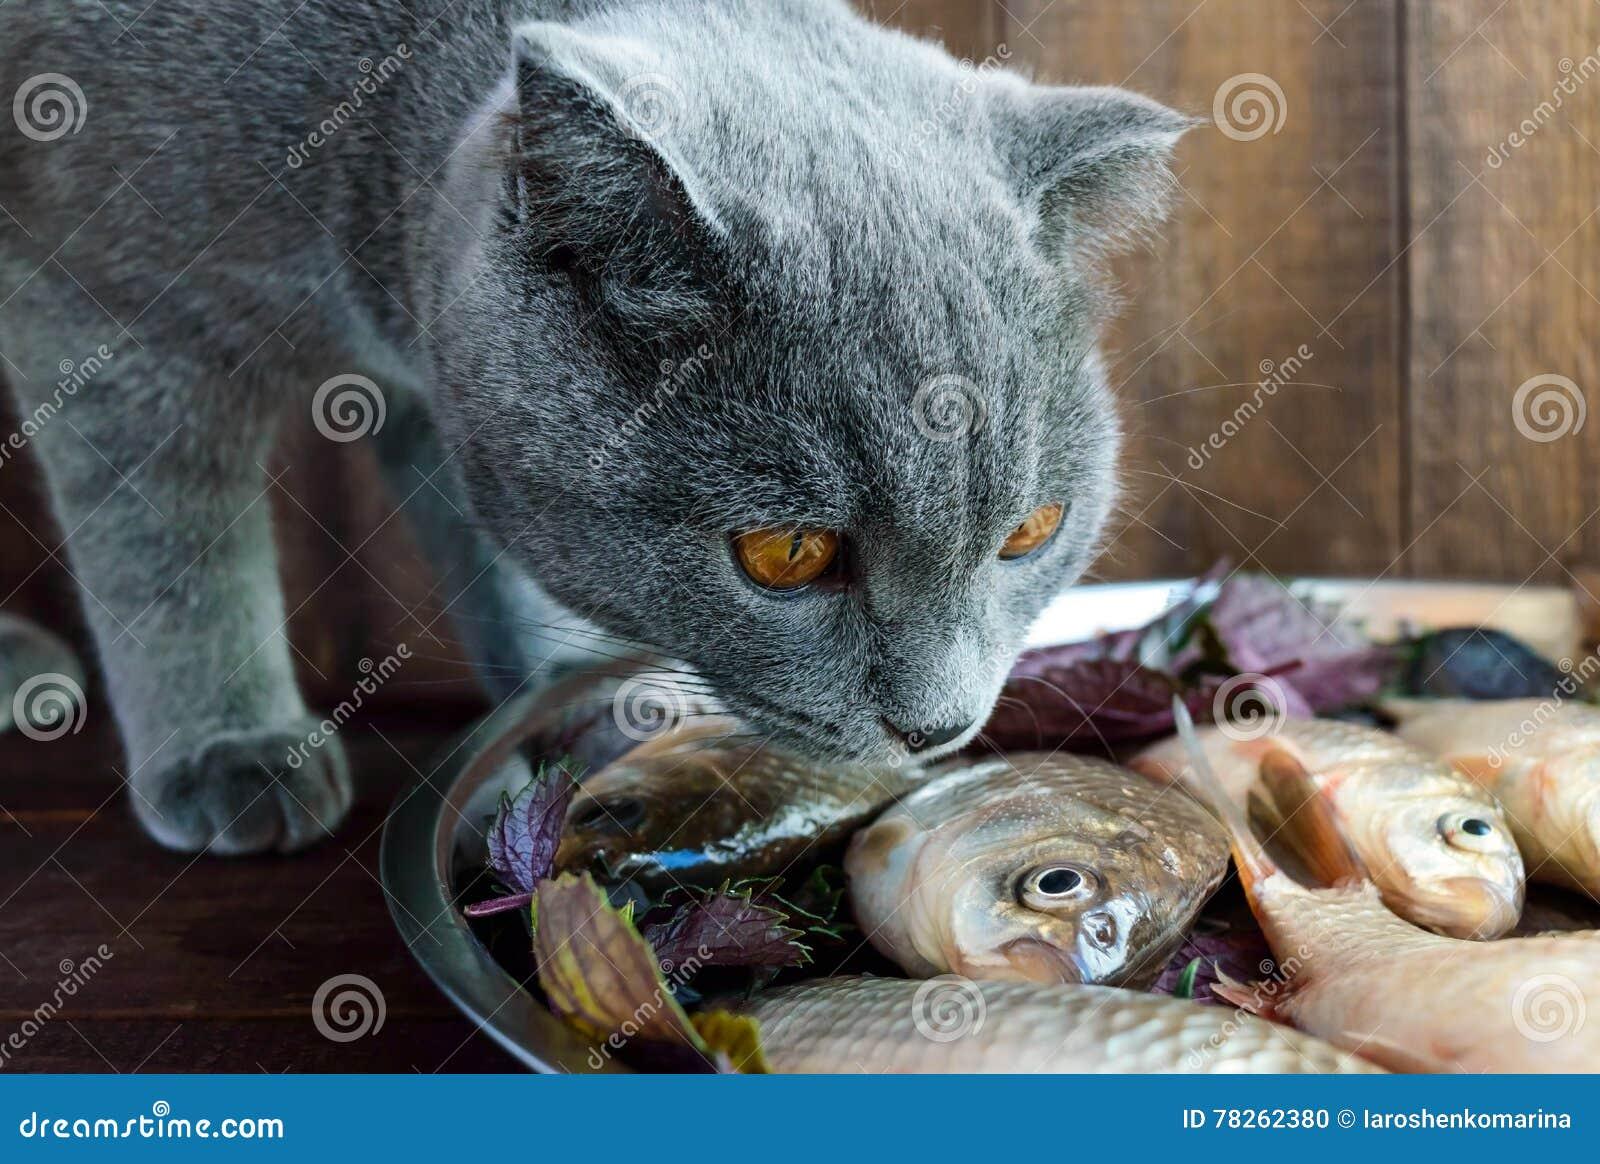 Peixes vivos da captura fresca & x28; carp& x29; e um gato que queira o comer